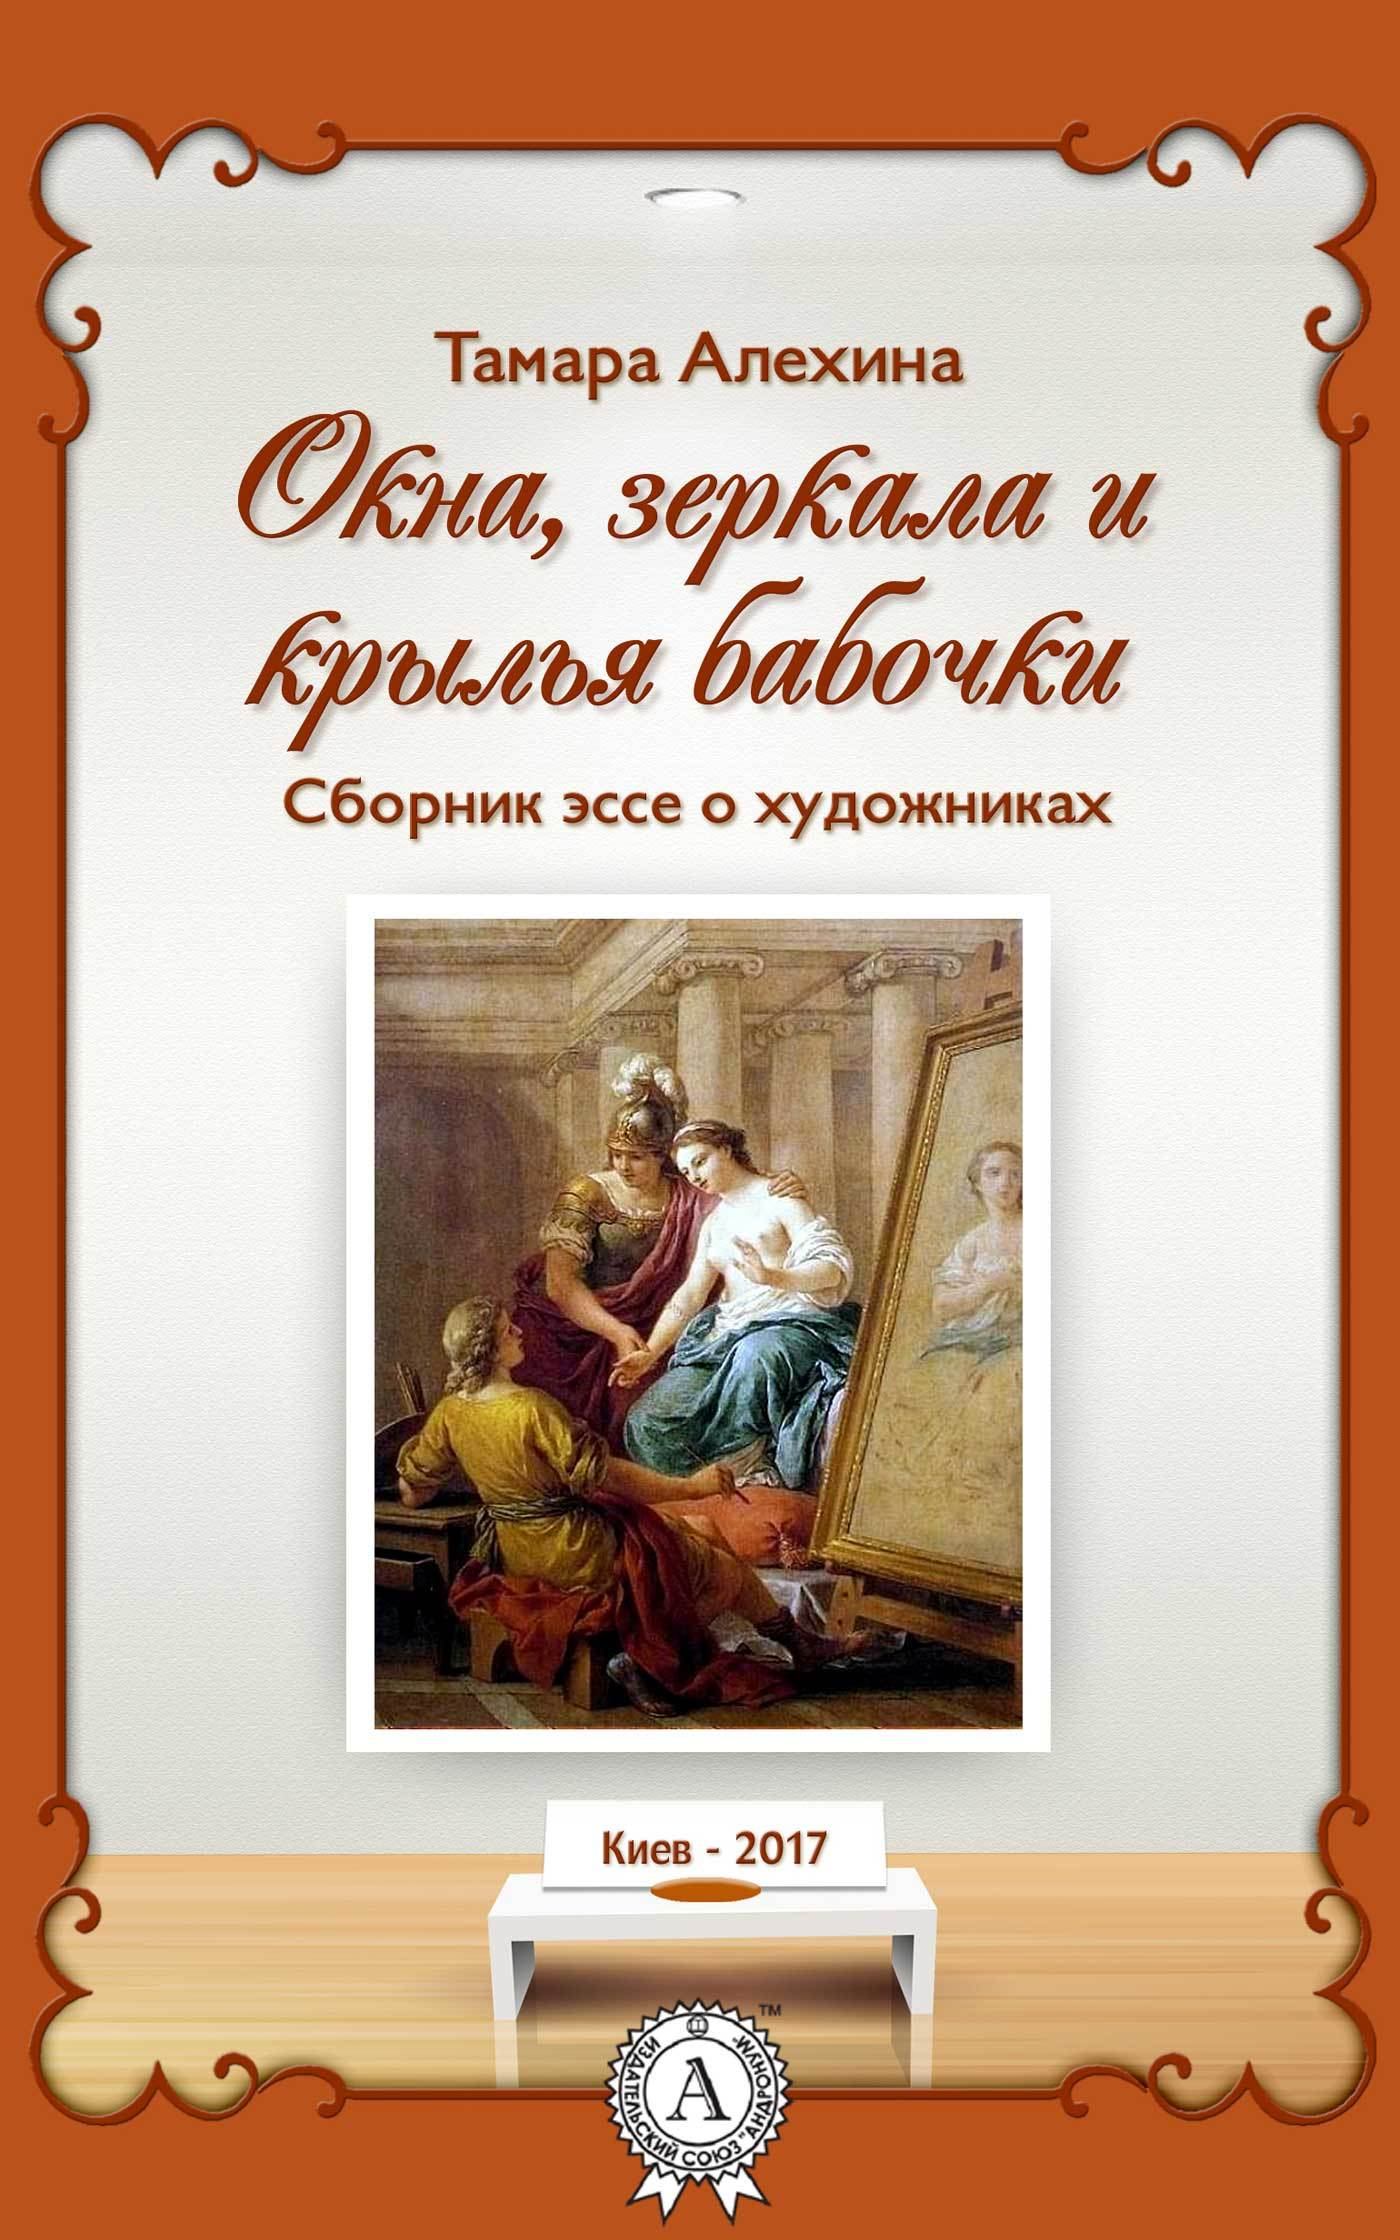 Тамара Алехина Окна, зеркала и крылья бабочки. Сборник эссе о художниках